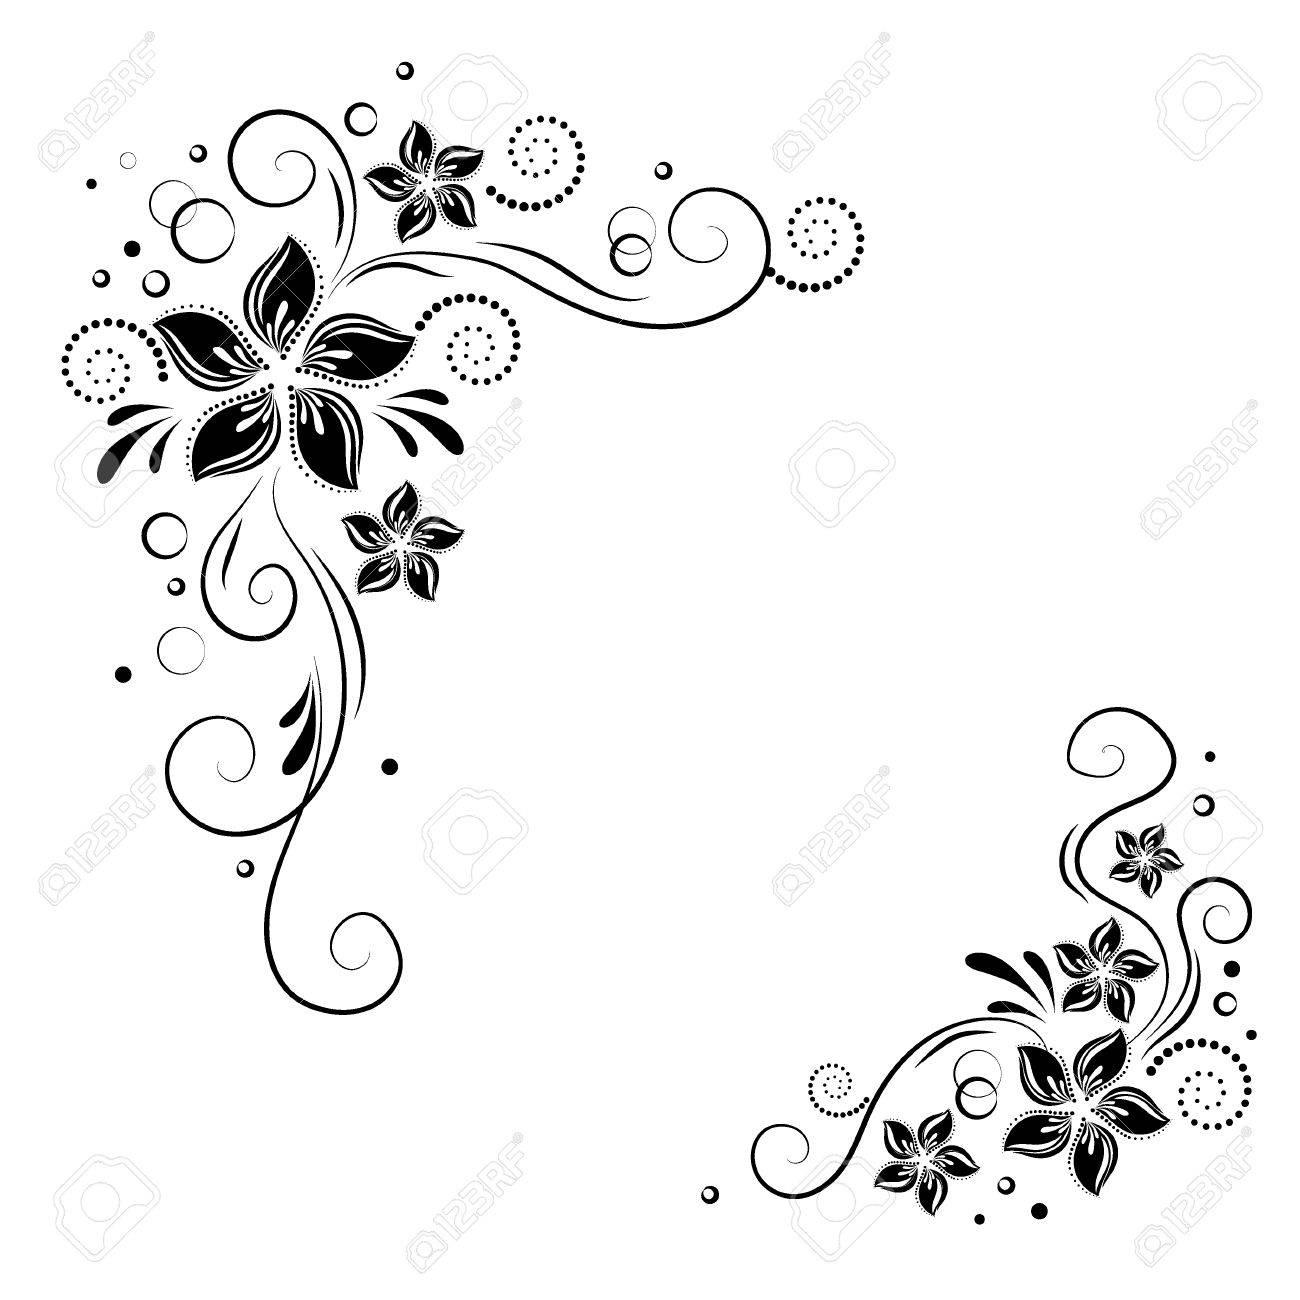 Floral corner design. Ornament black flowers. stock. Decorative border with flowery elements, flowers pattern - 68408828